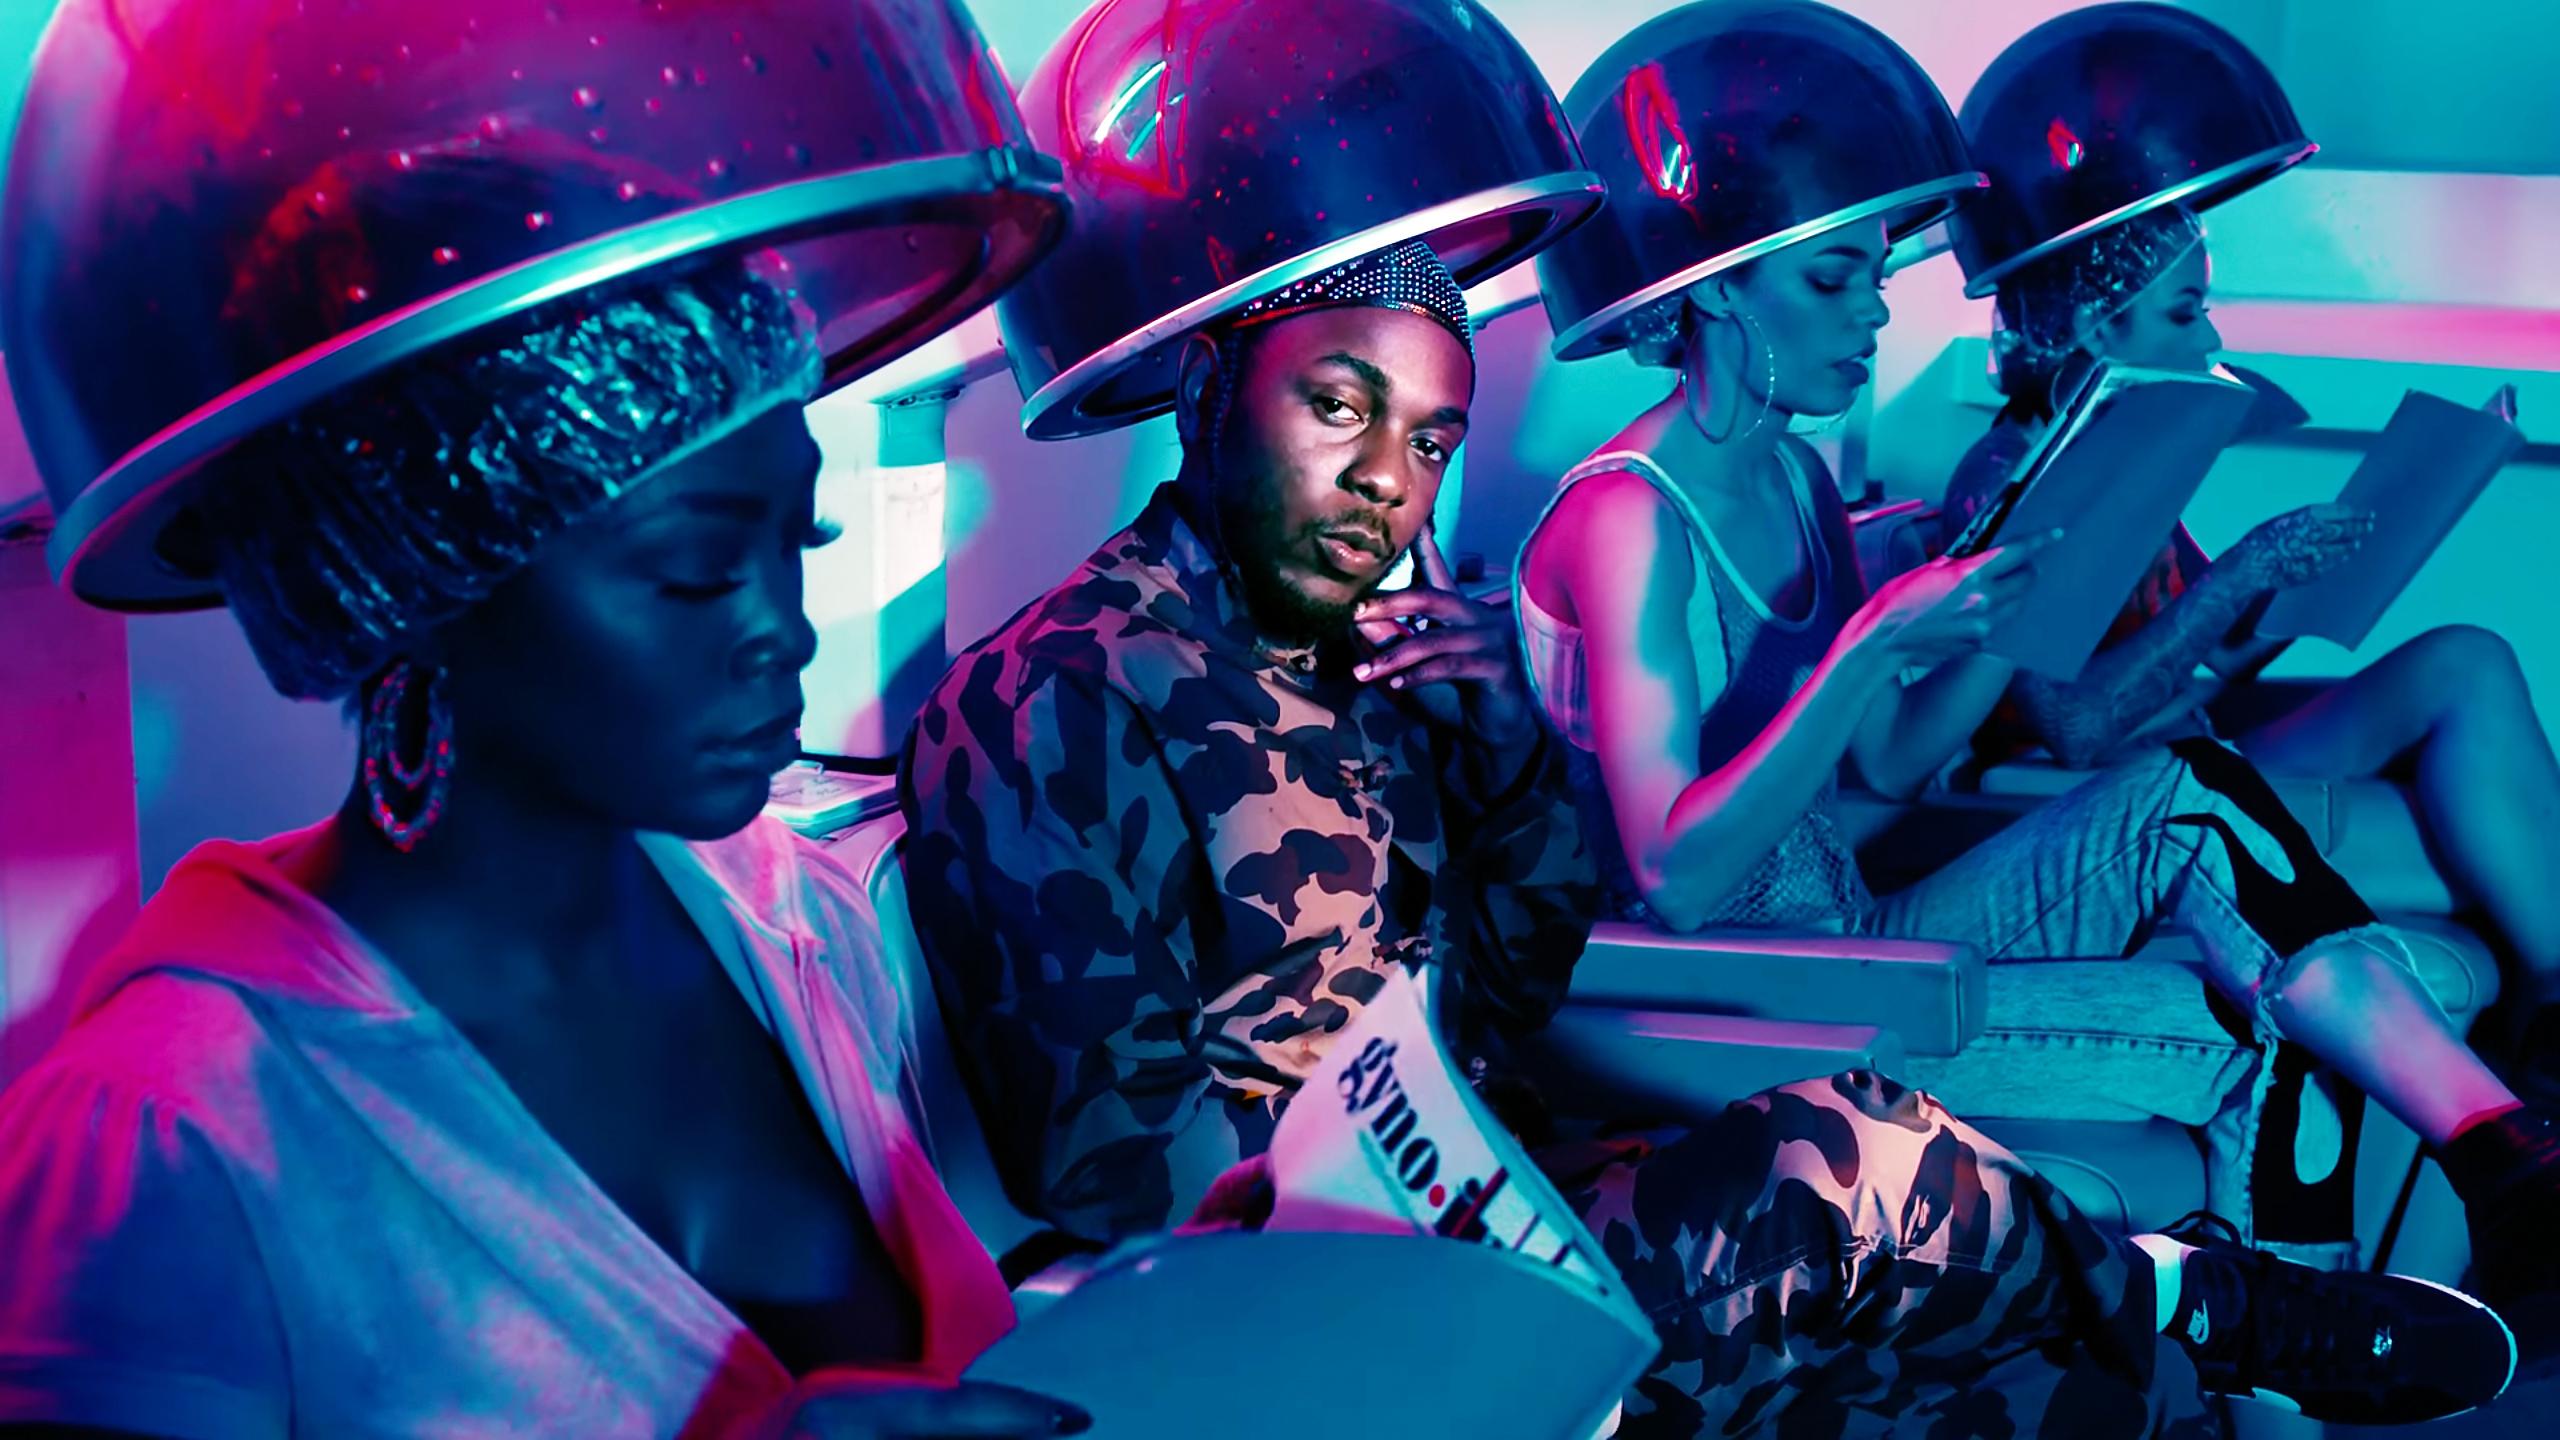 10 Best Music Videos Of 2017 Taylor Swift Kendrick Lamar